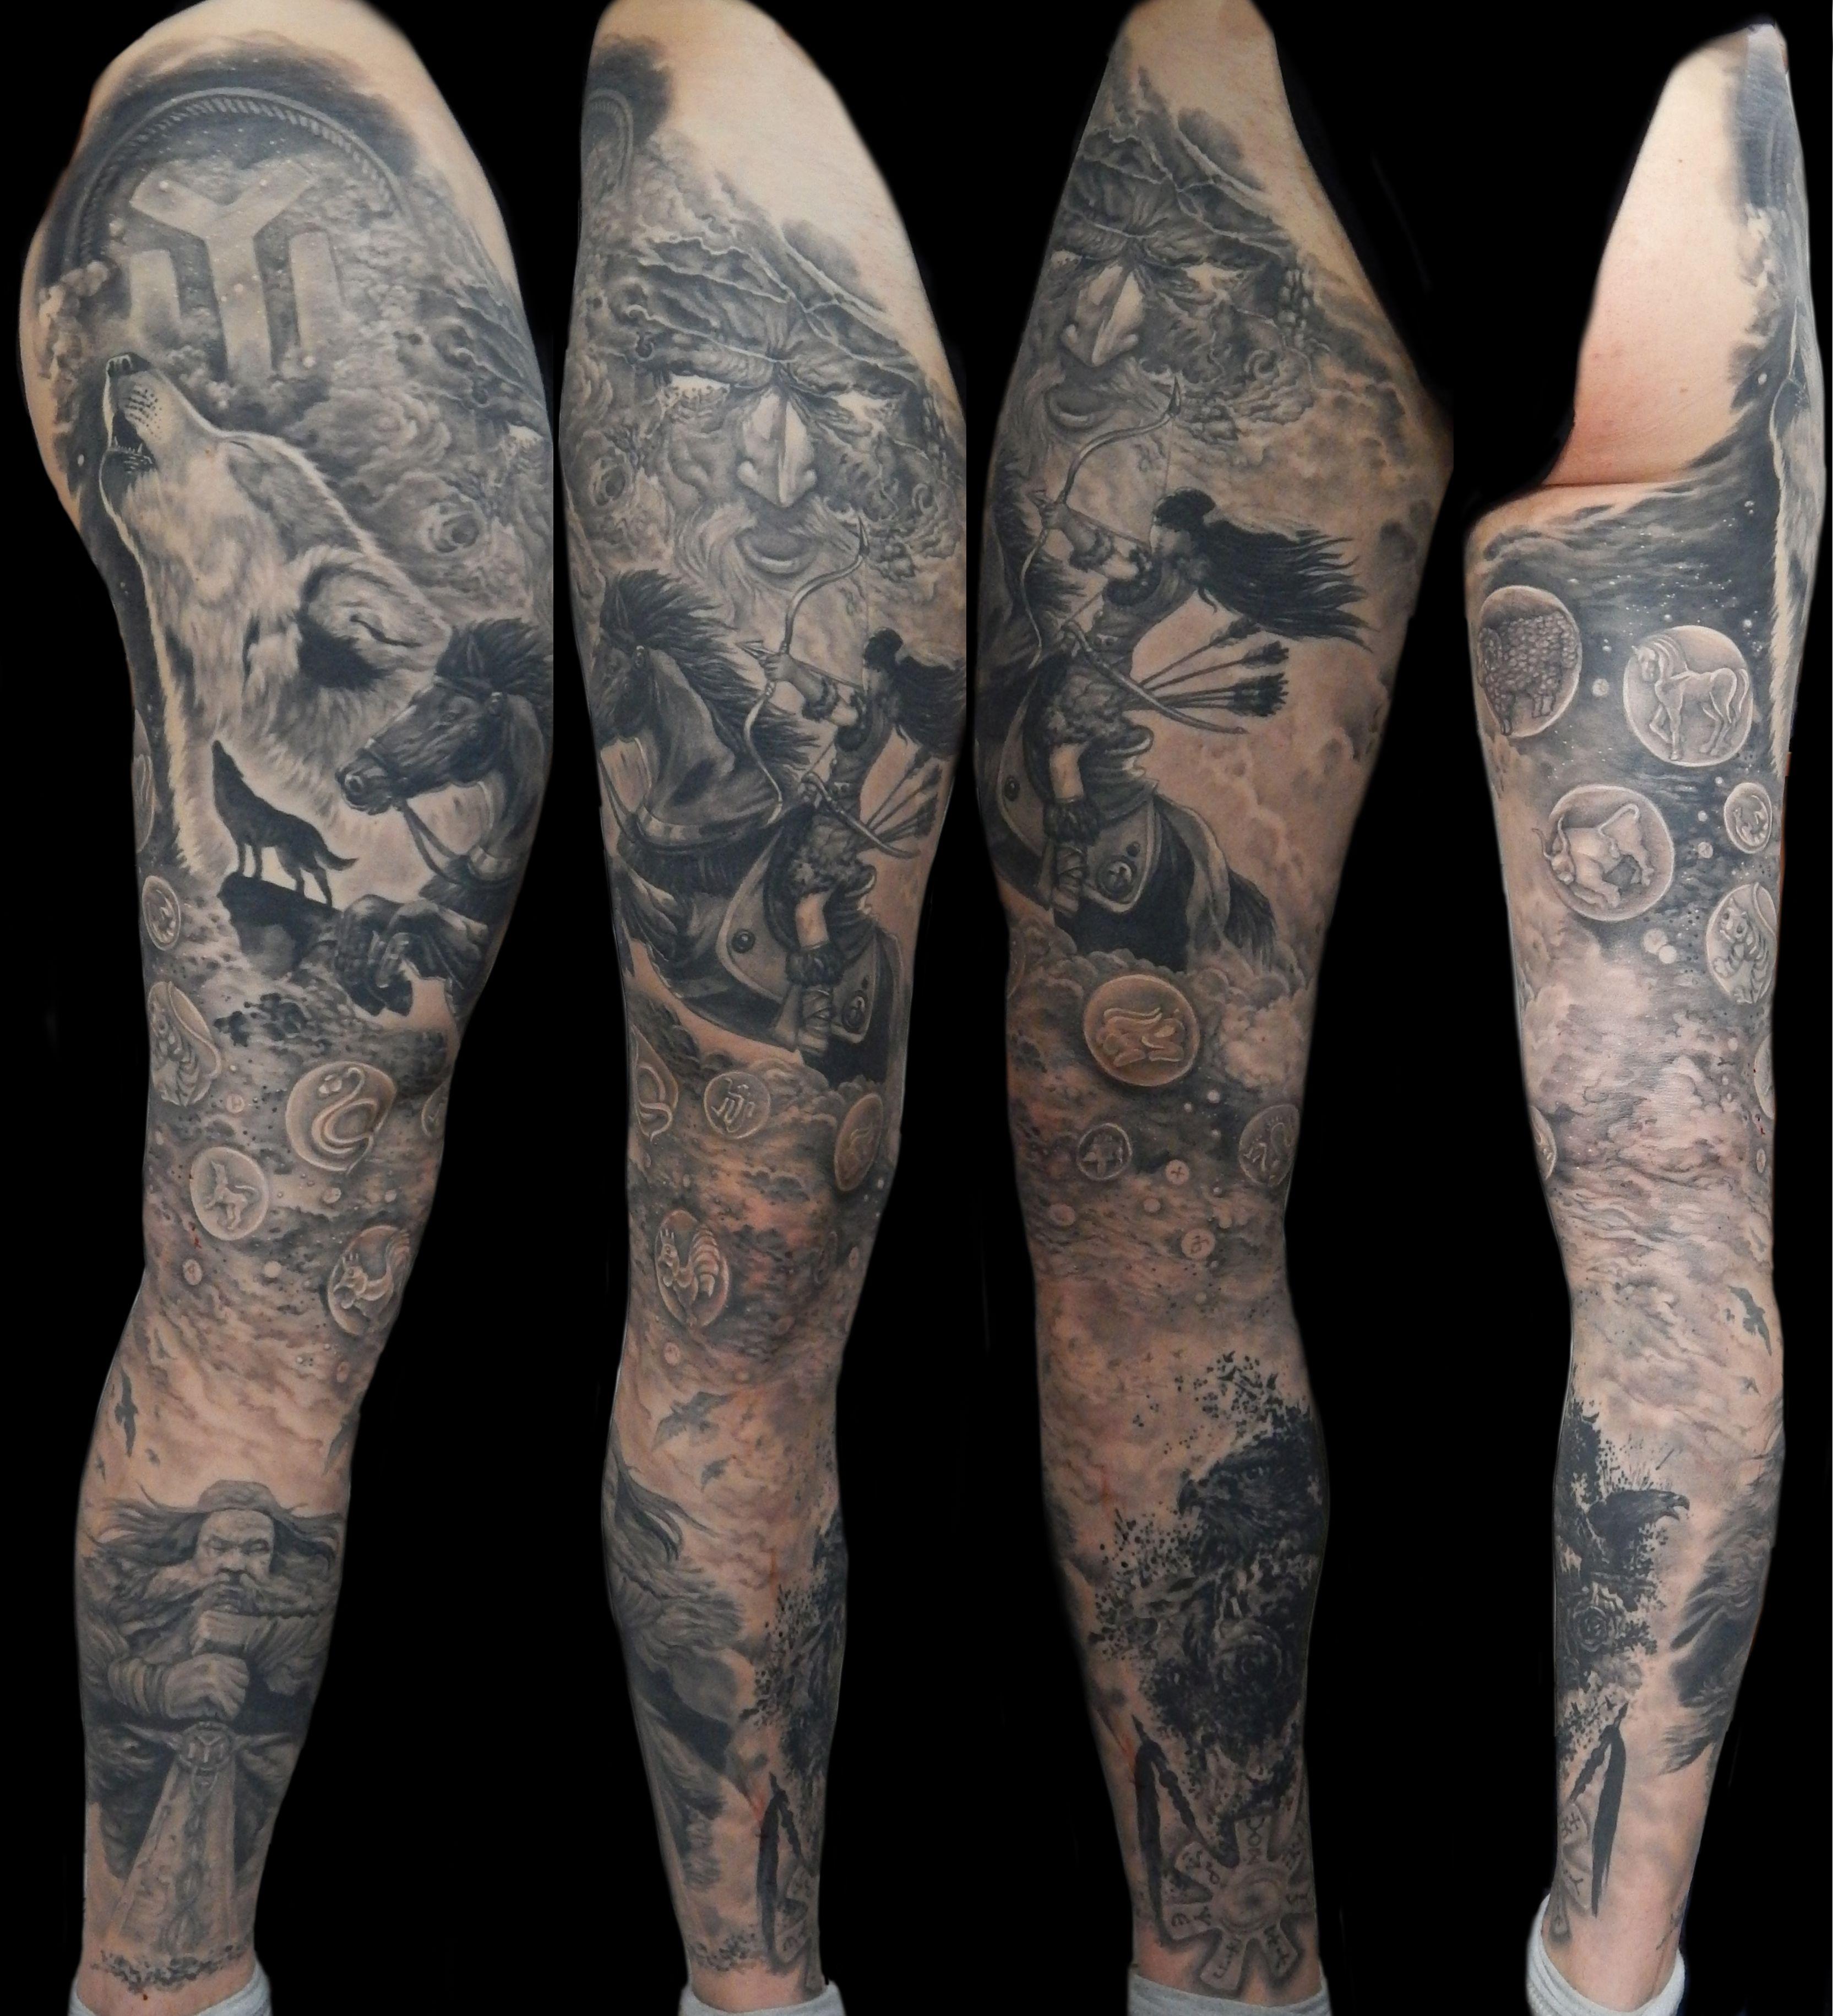 protobulgarian theme full leg tattoo bulgarian history tattoo nikolay tattoo pinterest. Black Bedroom Furniture Sets. Home Design Ideas